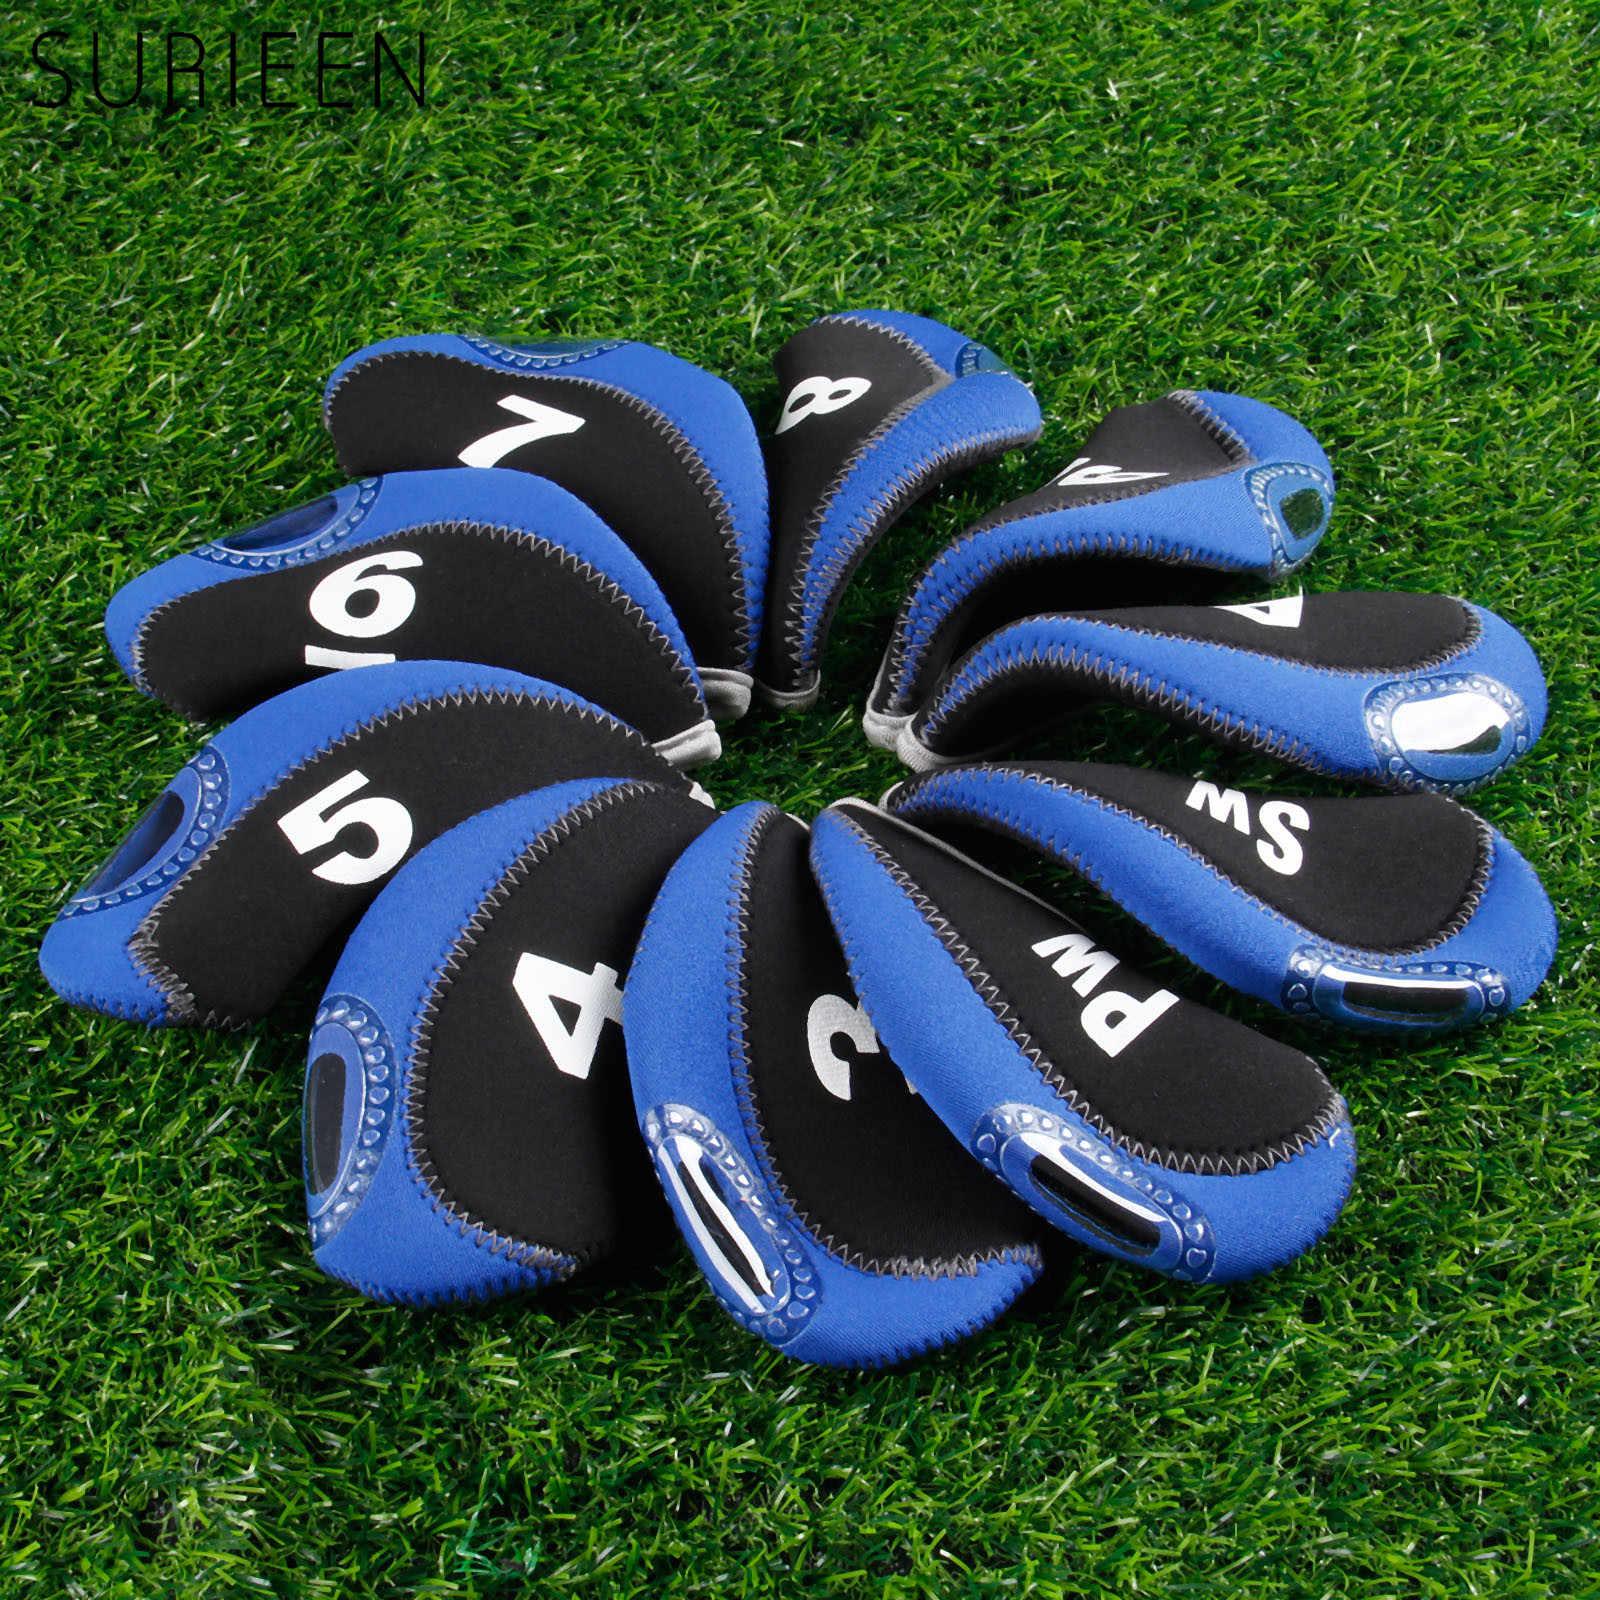 10 unids/lote cubierta de cabeza de Golf Club de Golf de hierro Putter cubre Protector de cabeza de Club de Golf accesorios 3 4 5 6 7 8 9 PW SW un